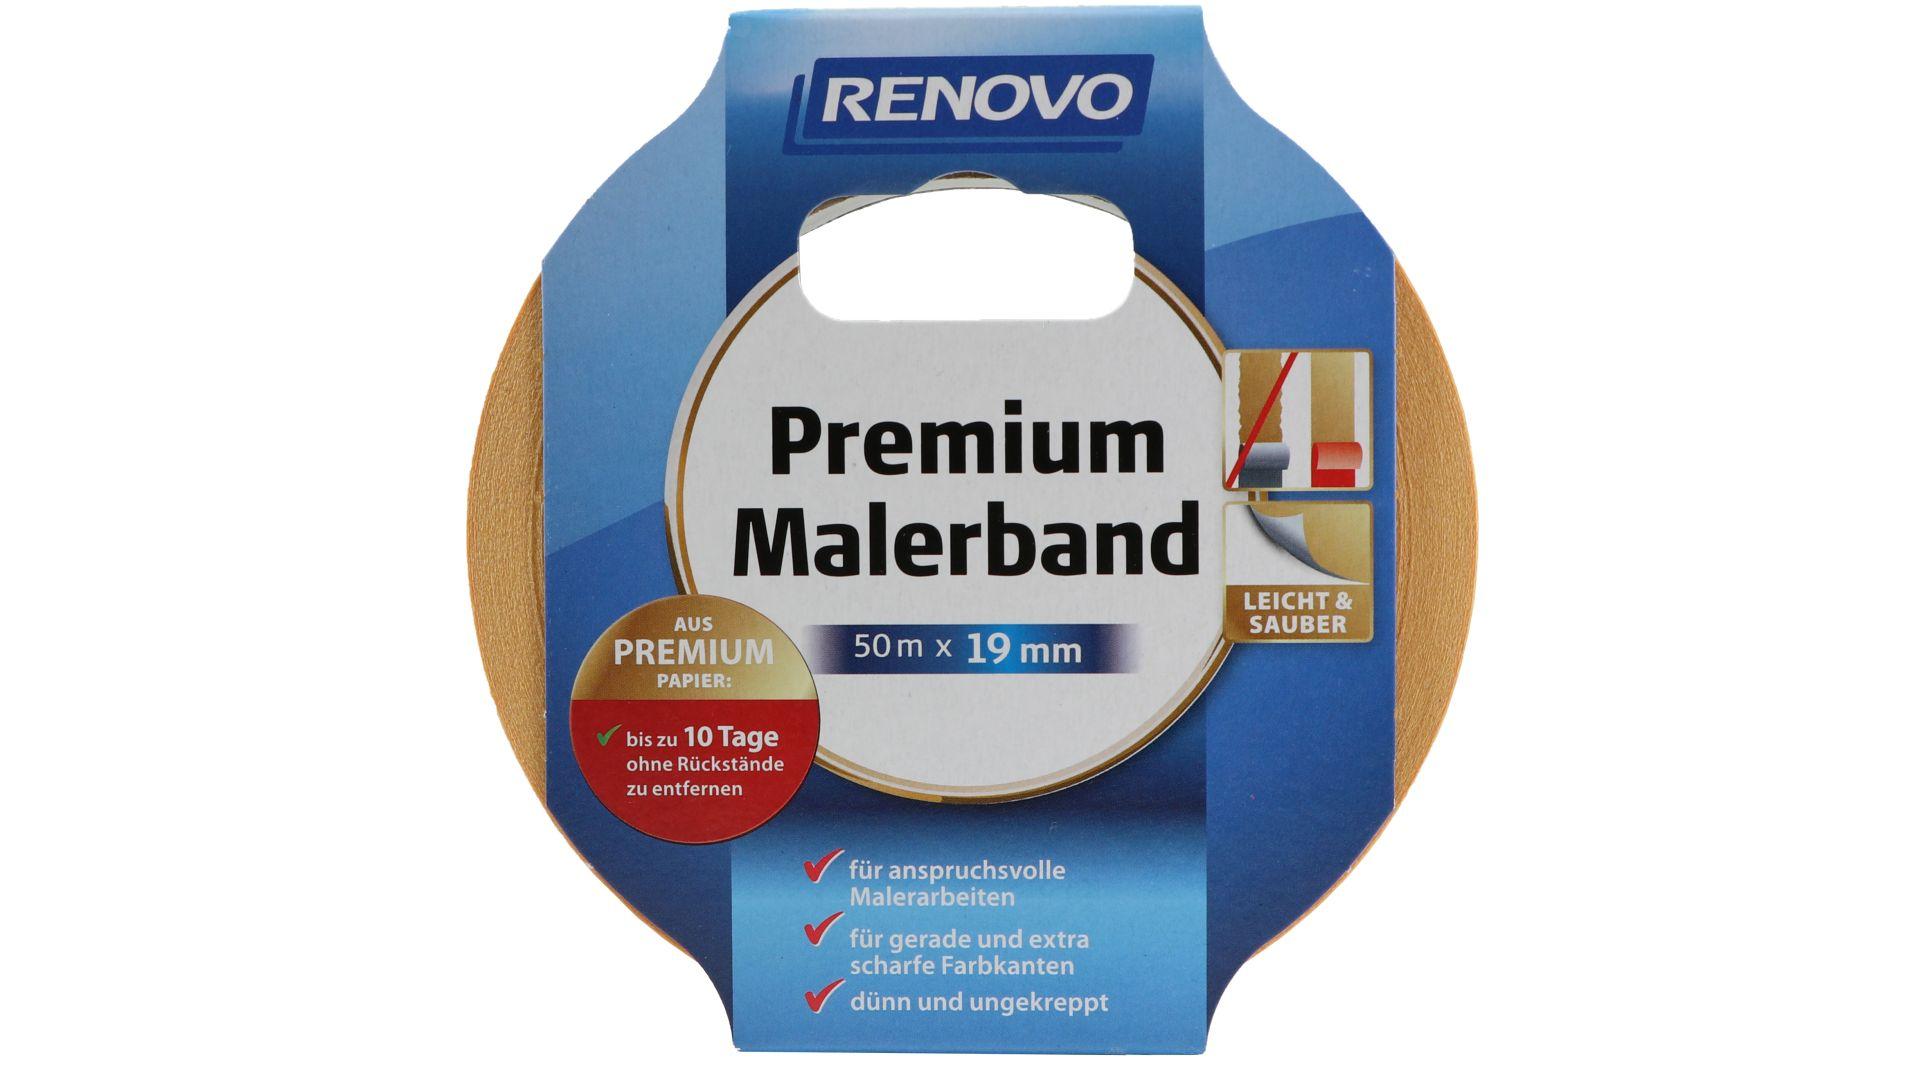 RENOVO Premium Malerband, 50 m x 19 mm